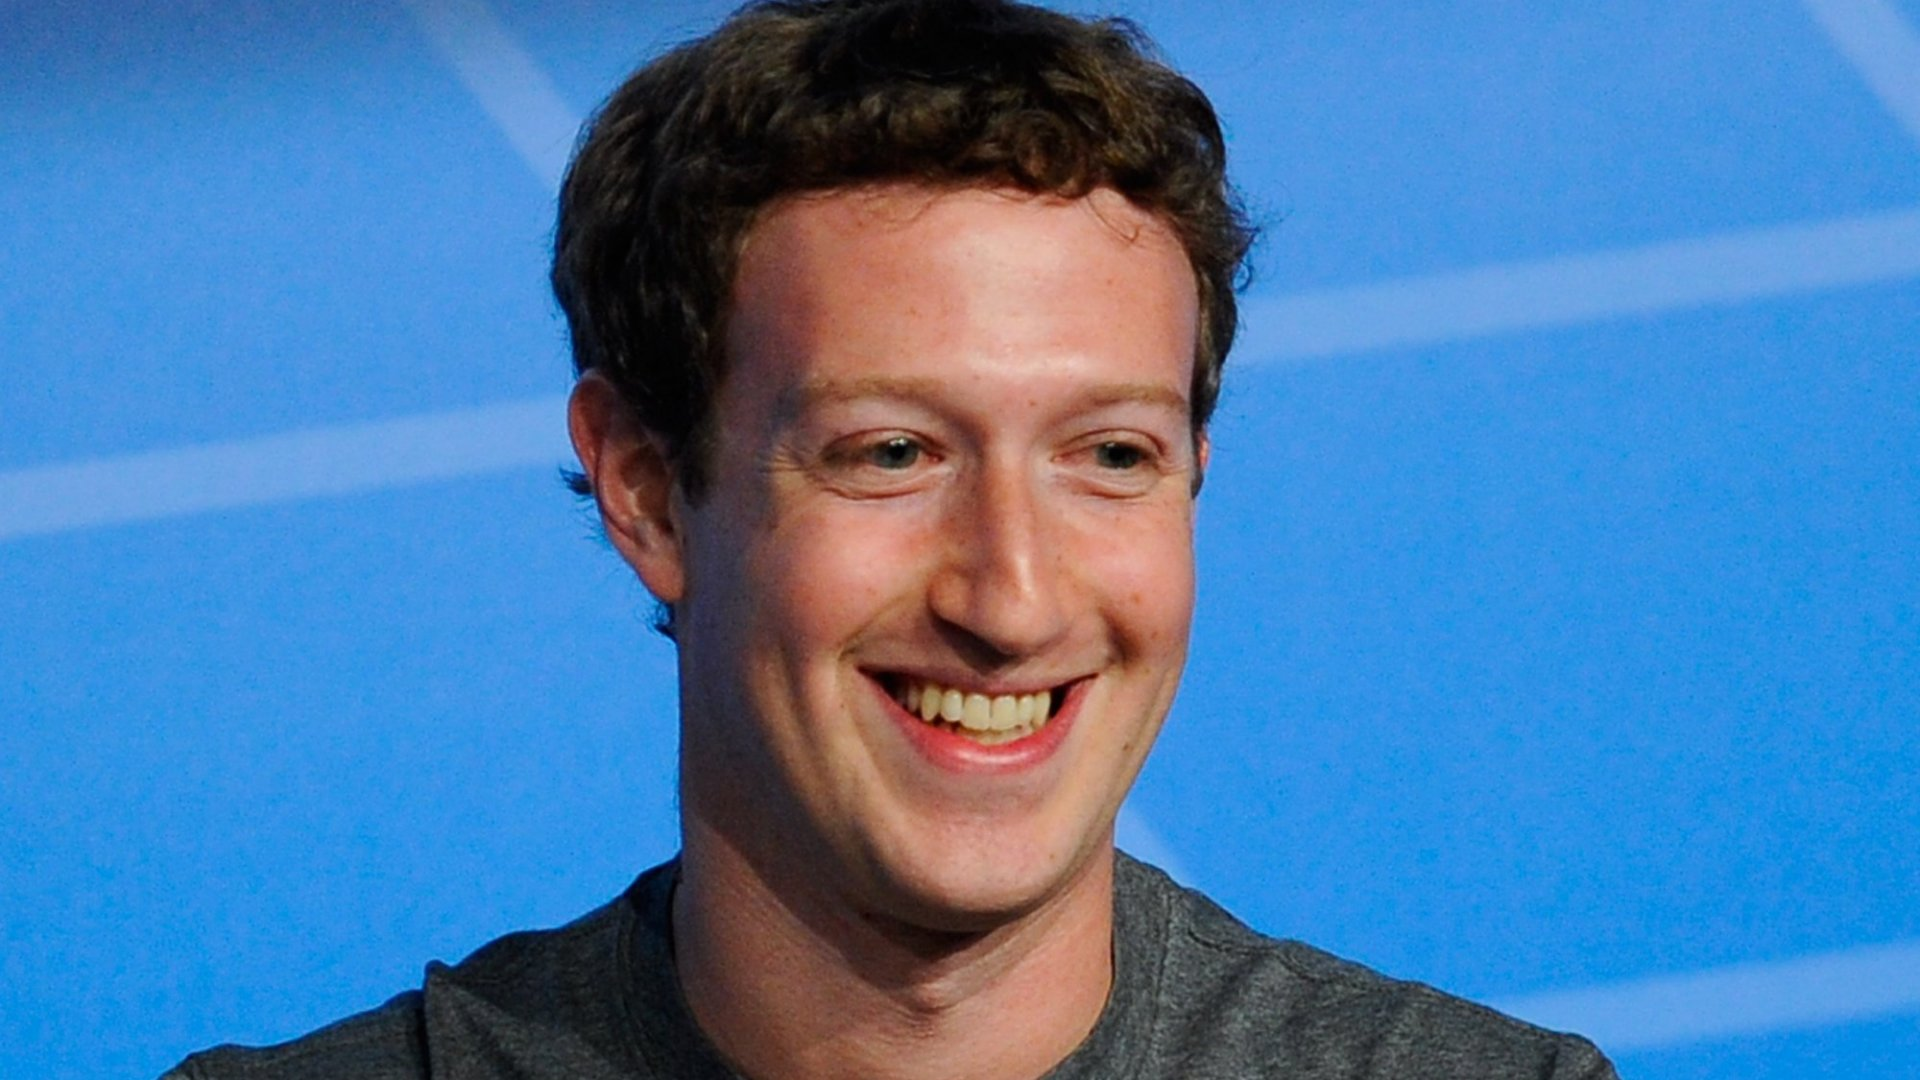 Mark Zuckerberg Wants to Foster Communities, Not Just 'Connections'